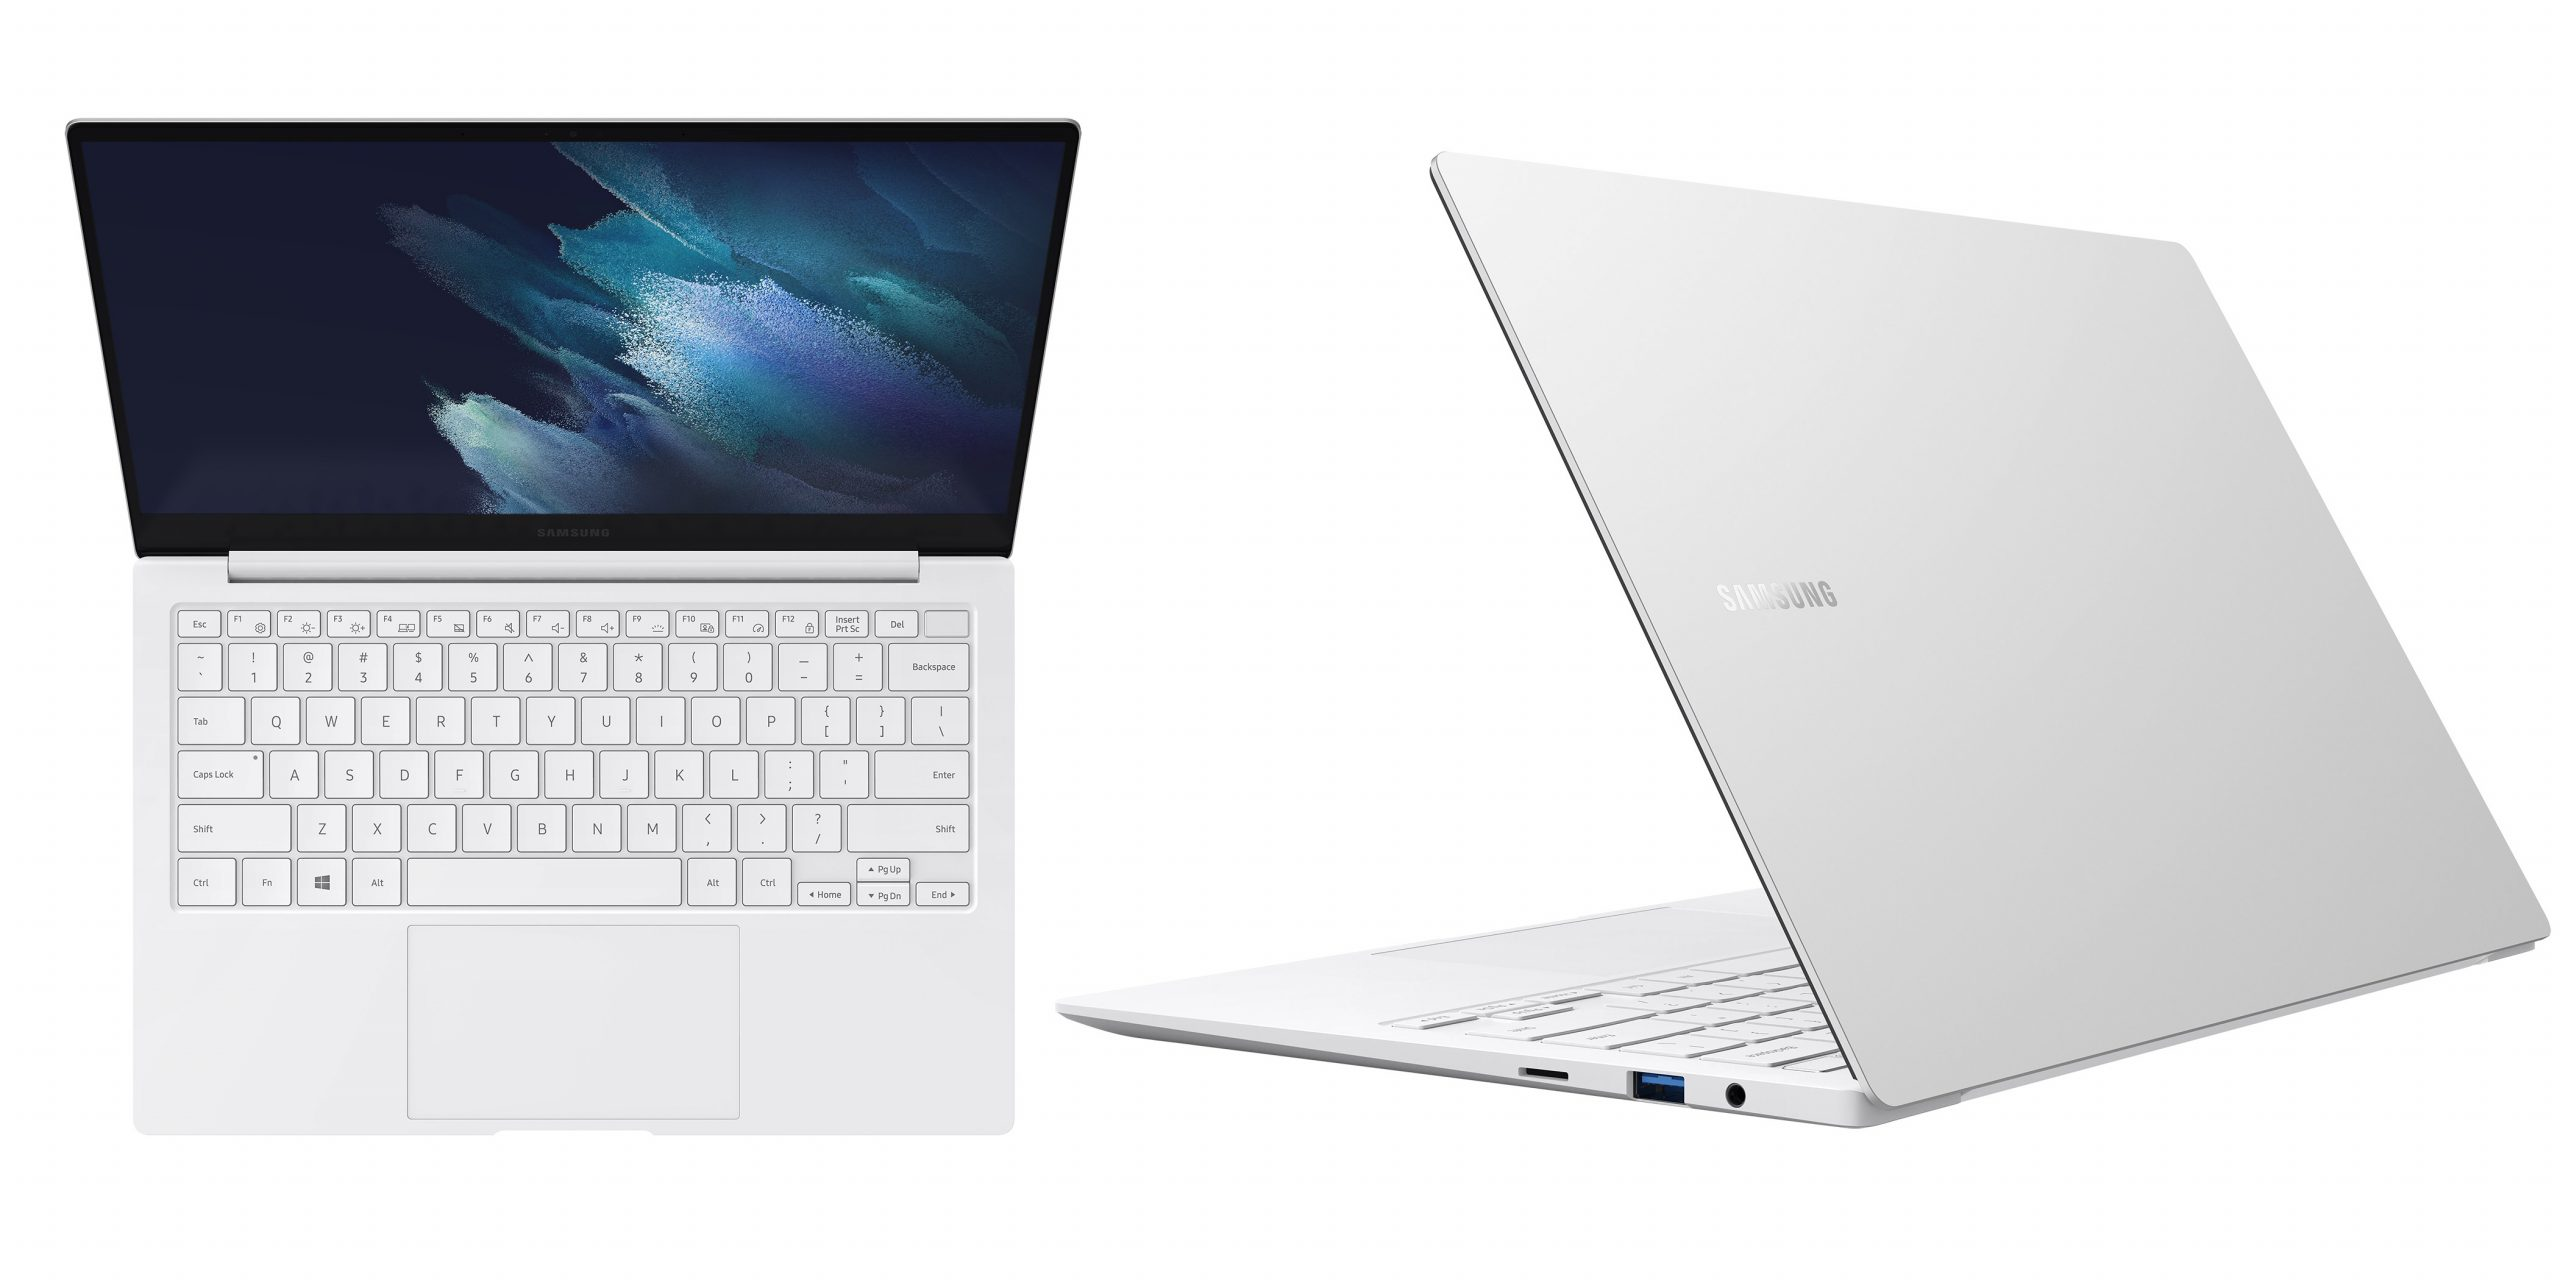 Samsung представила флагманские ноутбуки Galaxy Book Pro и Pro 360 с  OLED-дисплеями - Лайфхакер